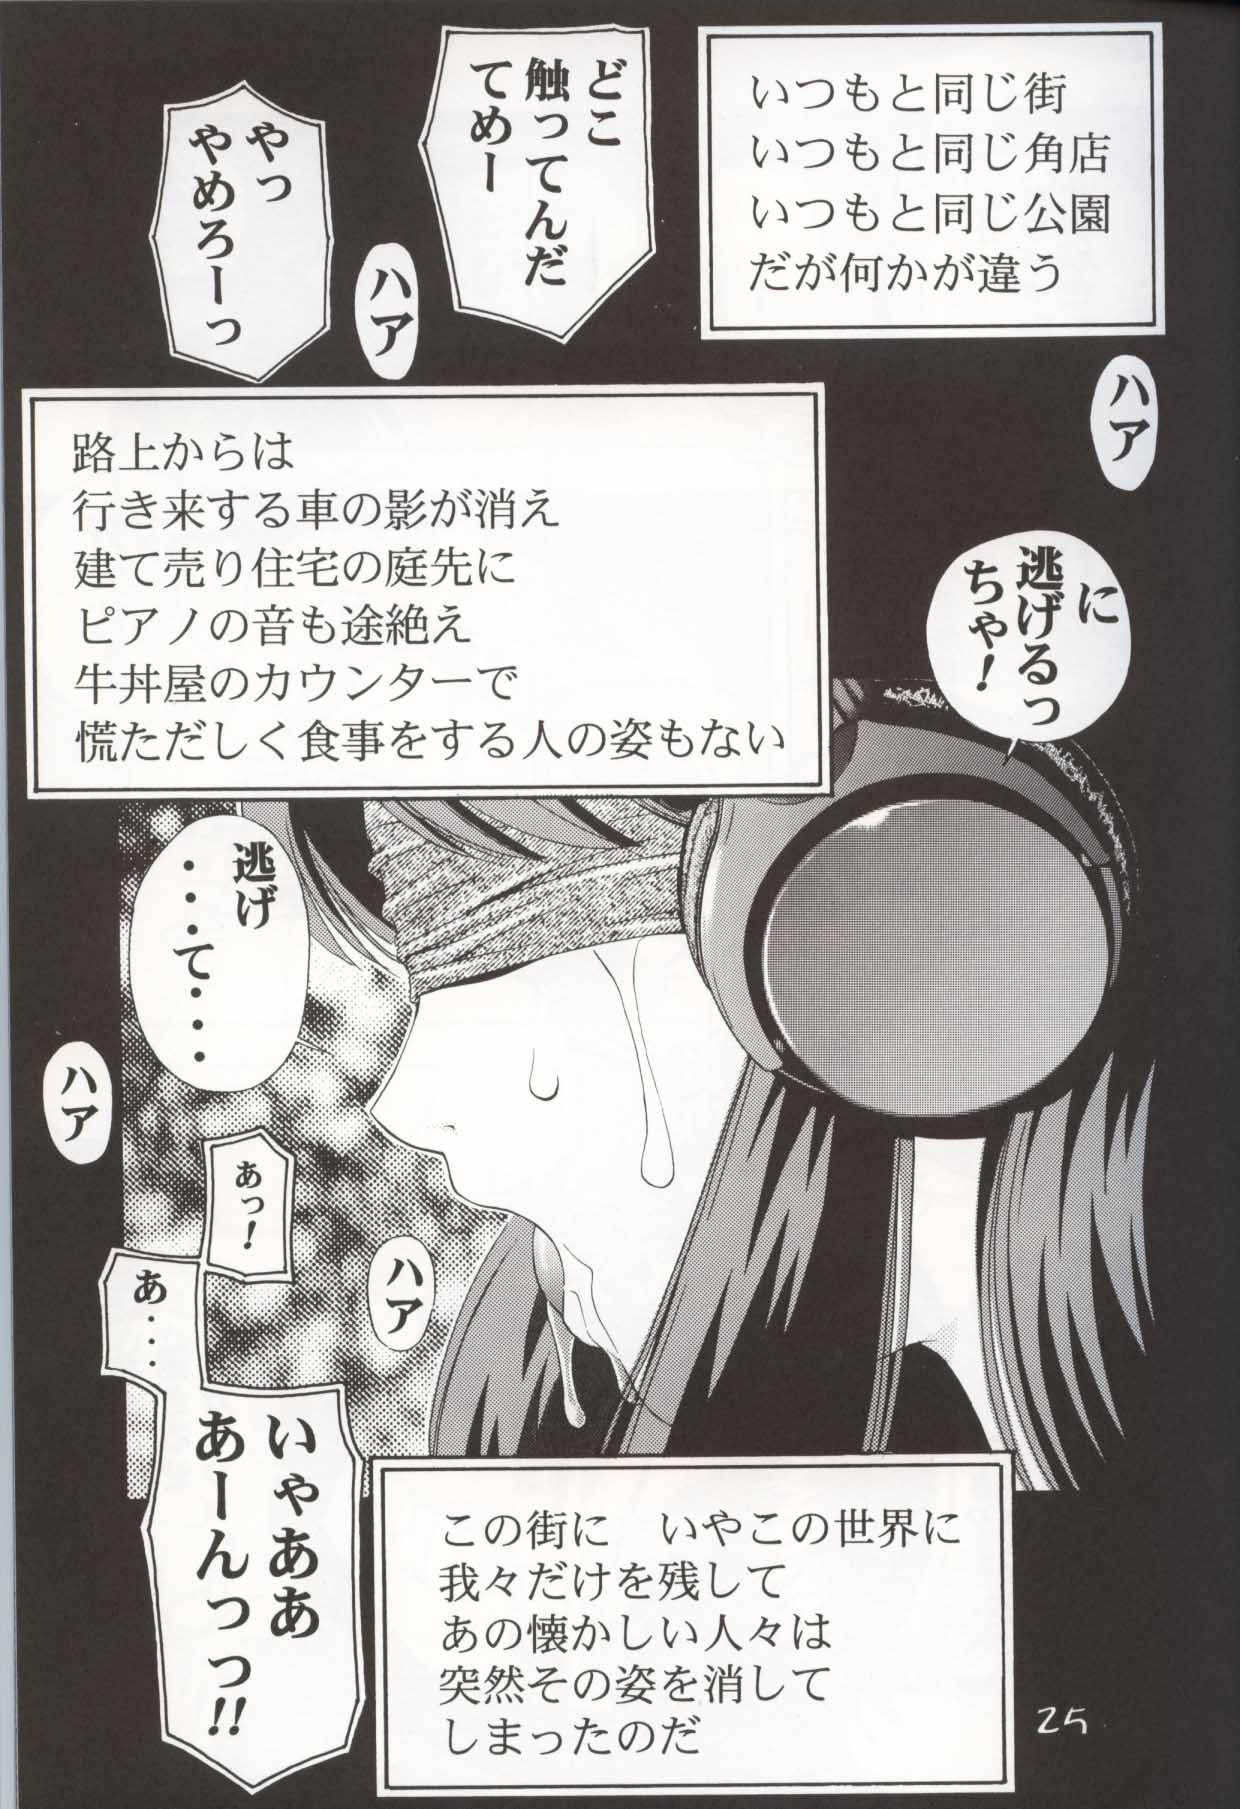 GIRL POWER Vol.10 23